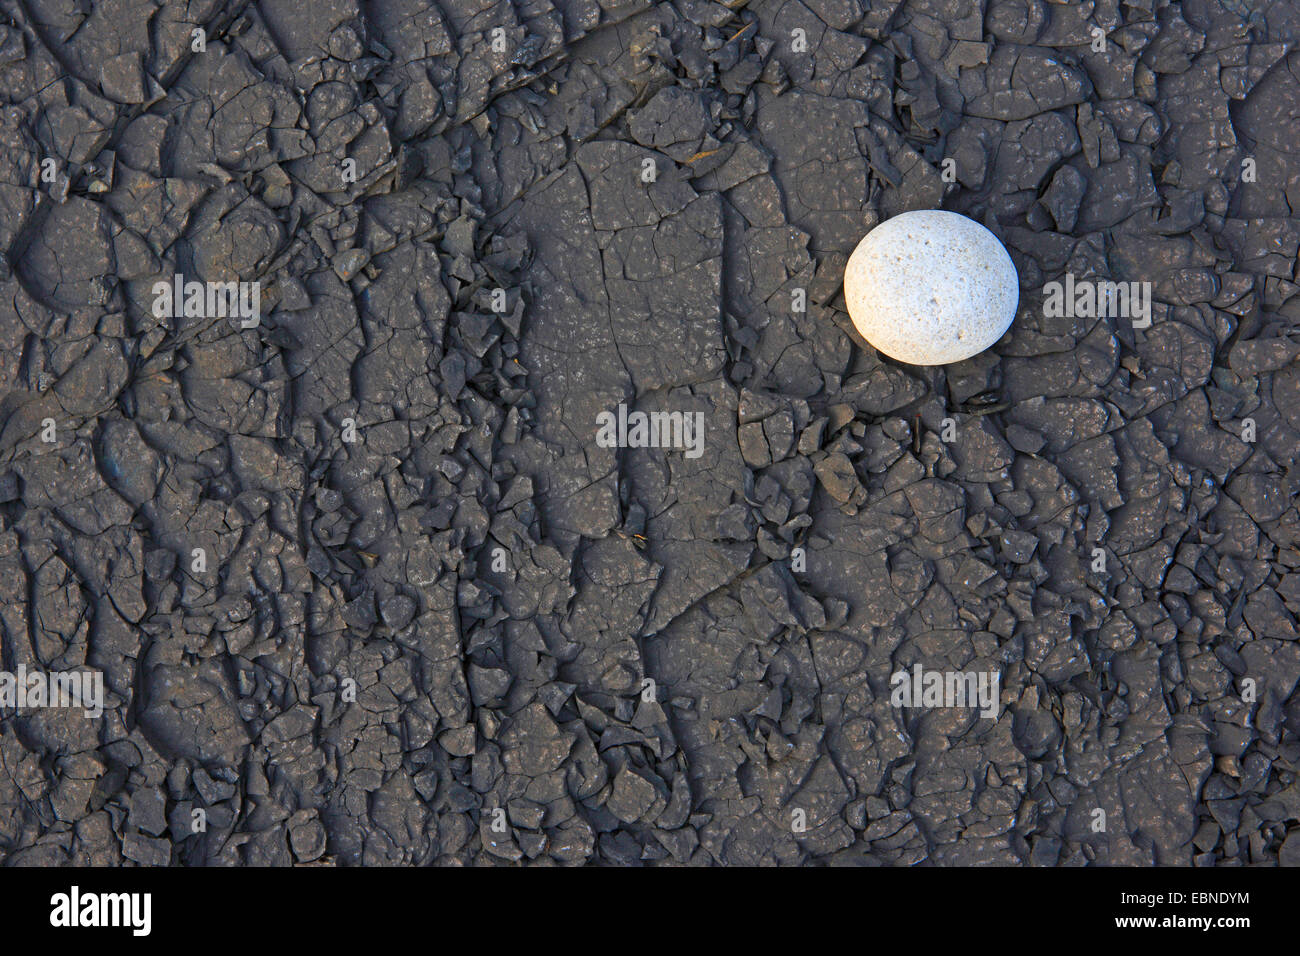 white stone on black beach, United Kingdom, Scotland - Stock Image